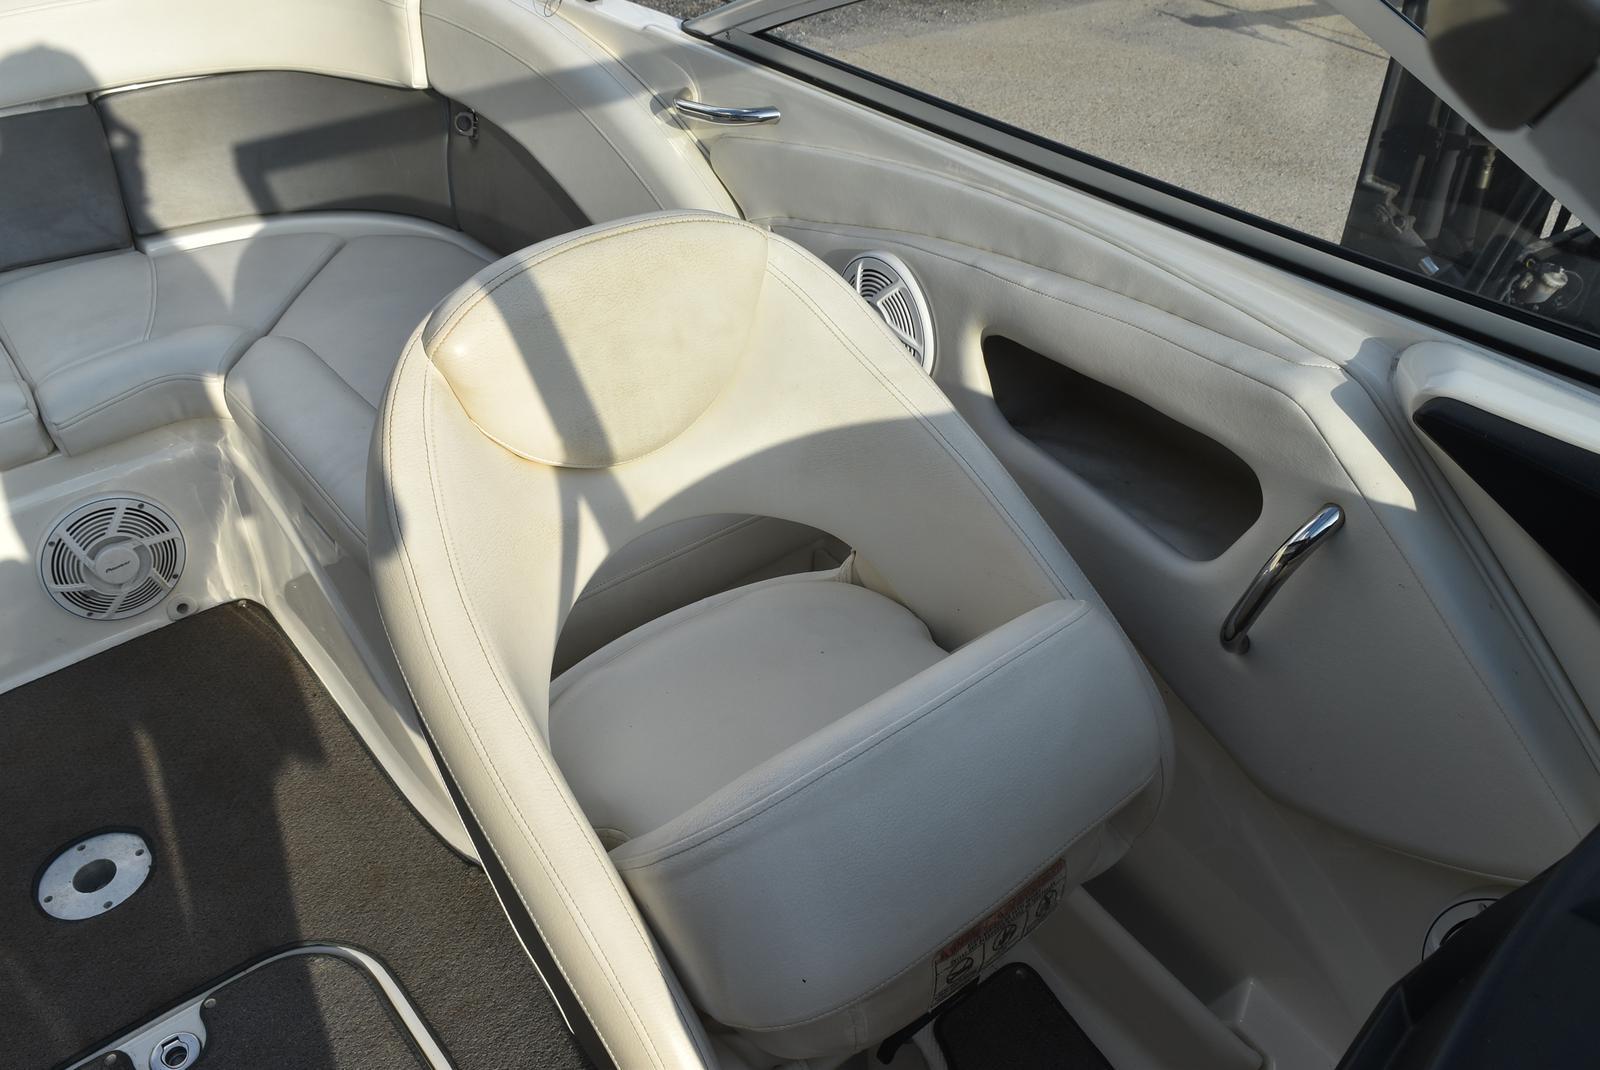 2010 Bayliner boat for sale, model of the boat is 235BR & Image # 19 of 43